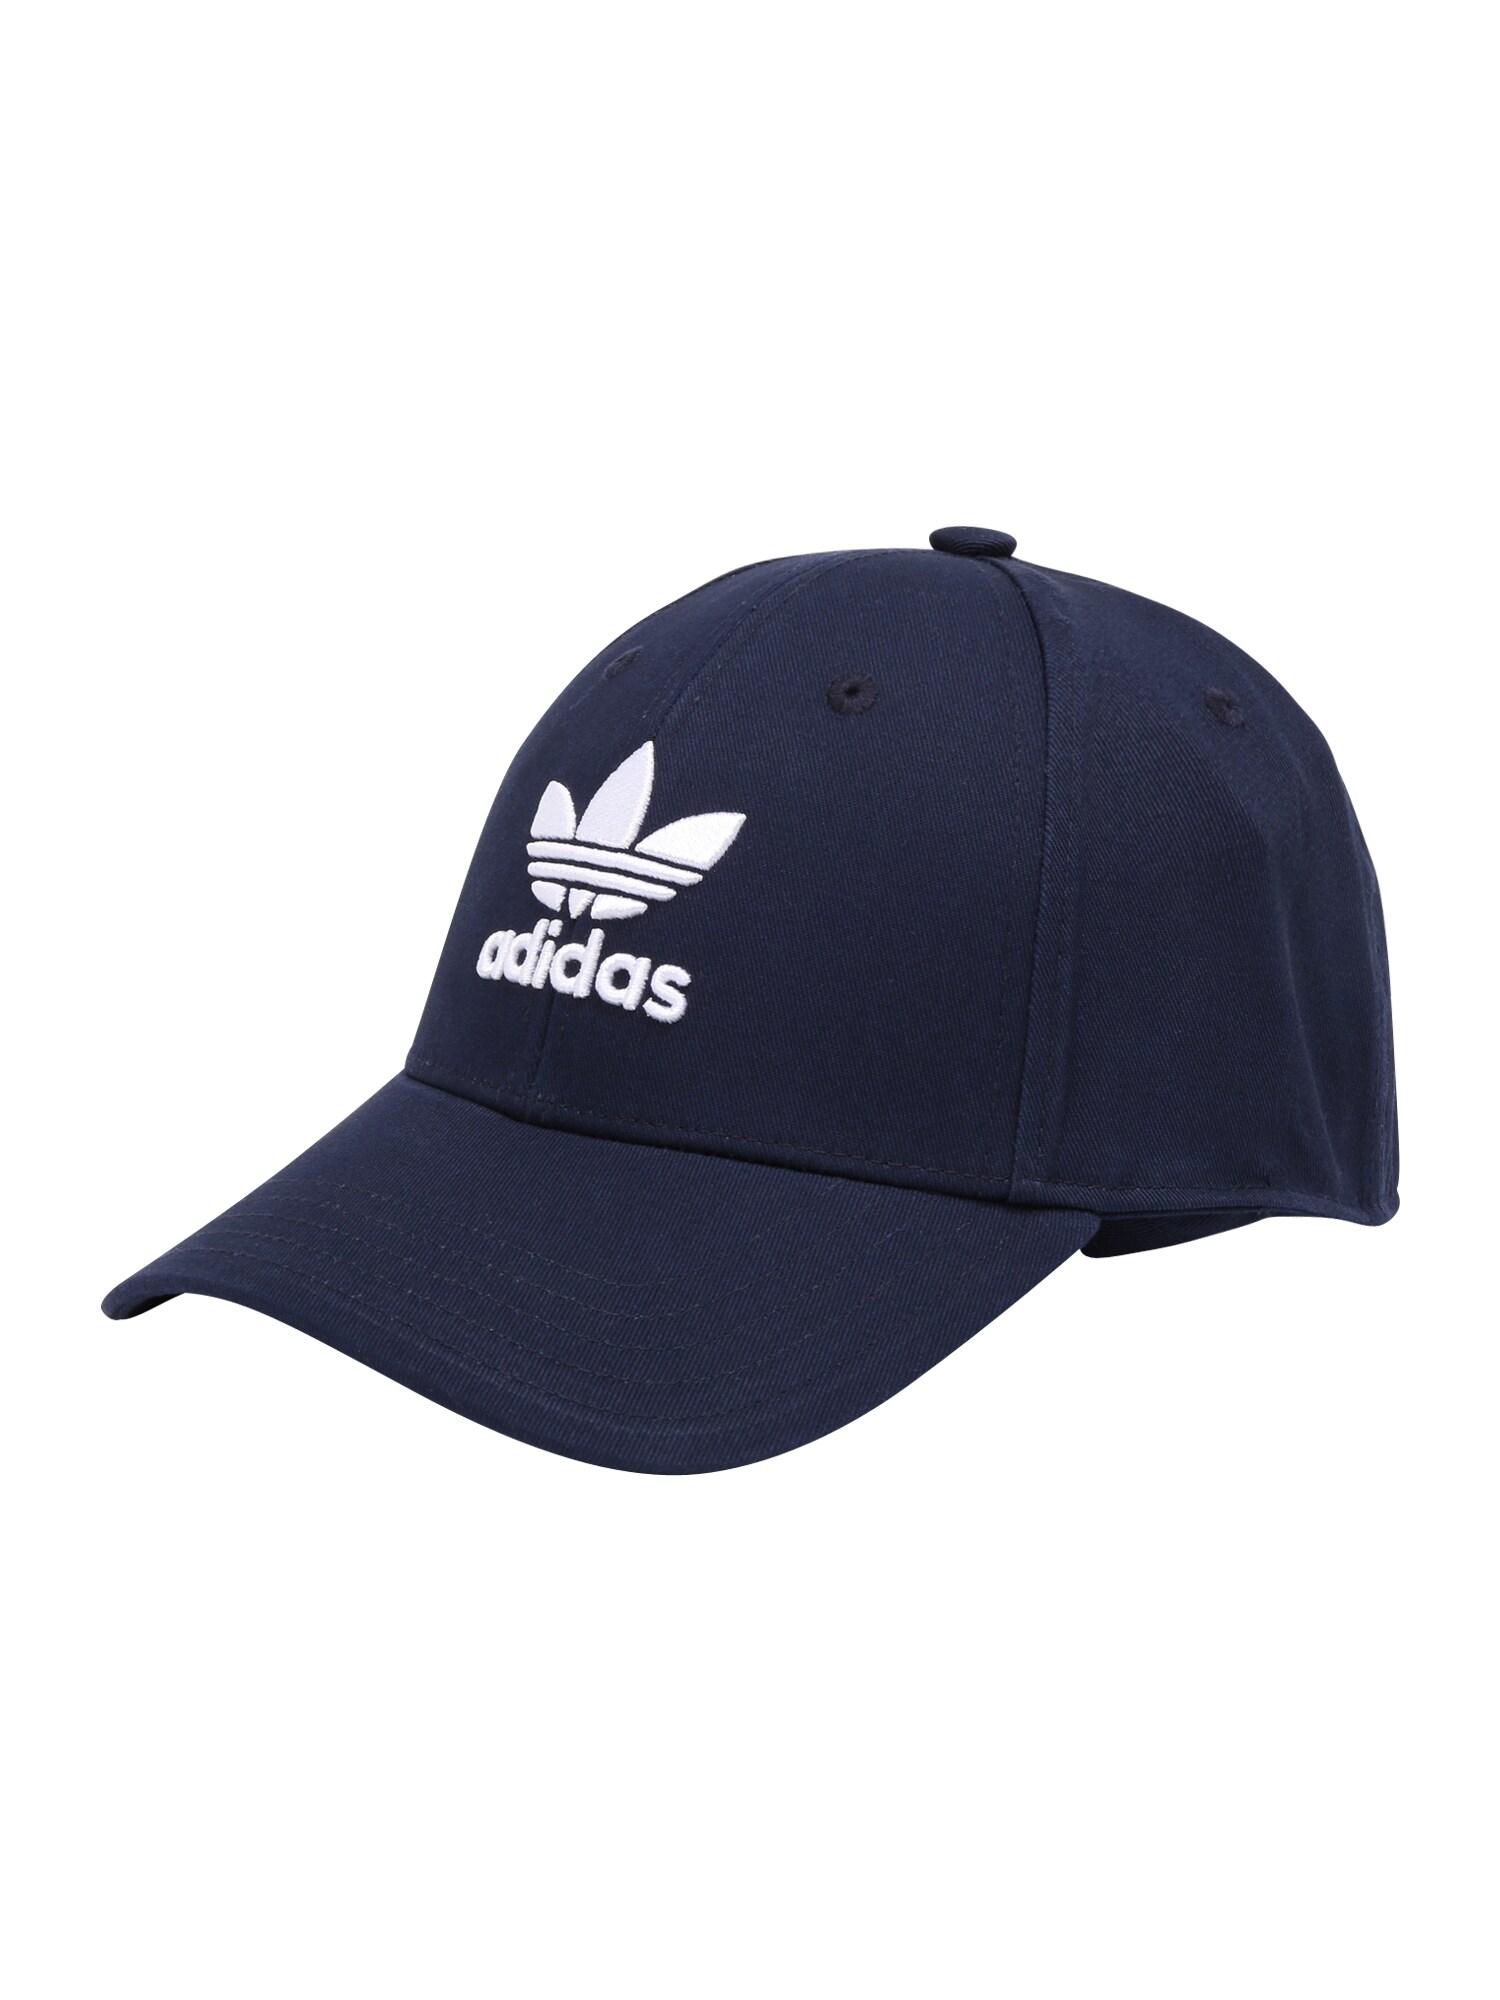 ADIDAS ORIGINALS Kepurė mėlyna